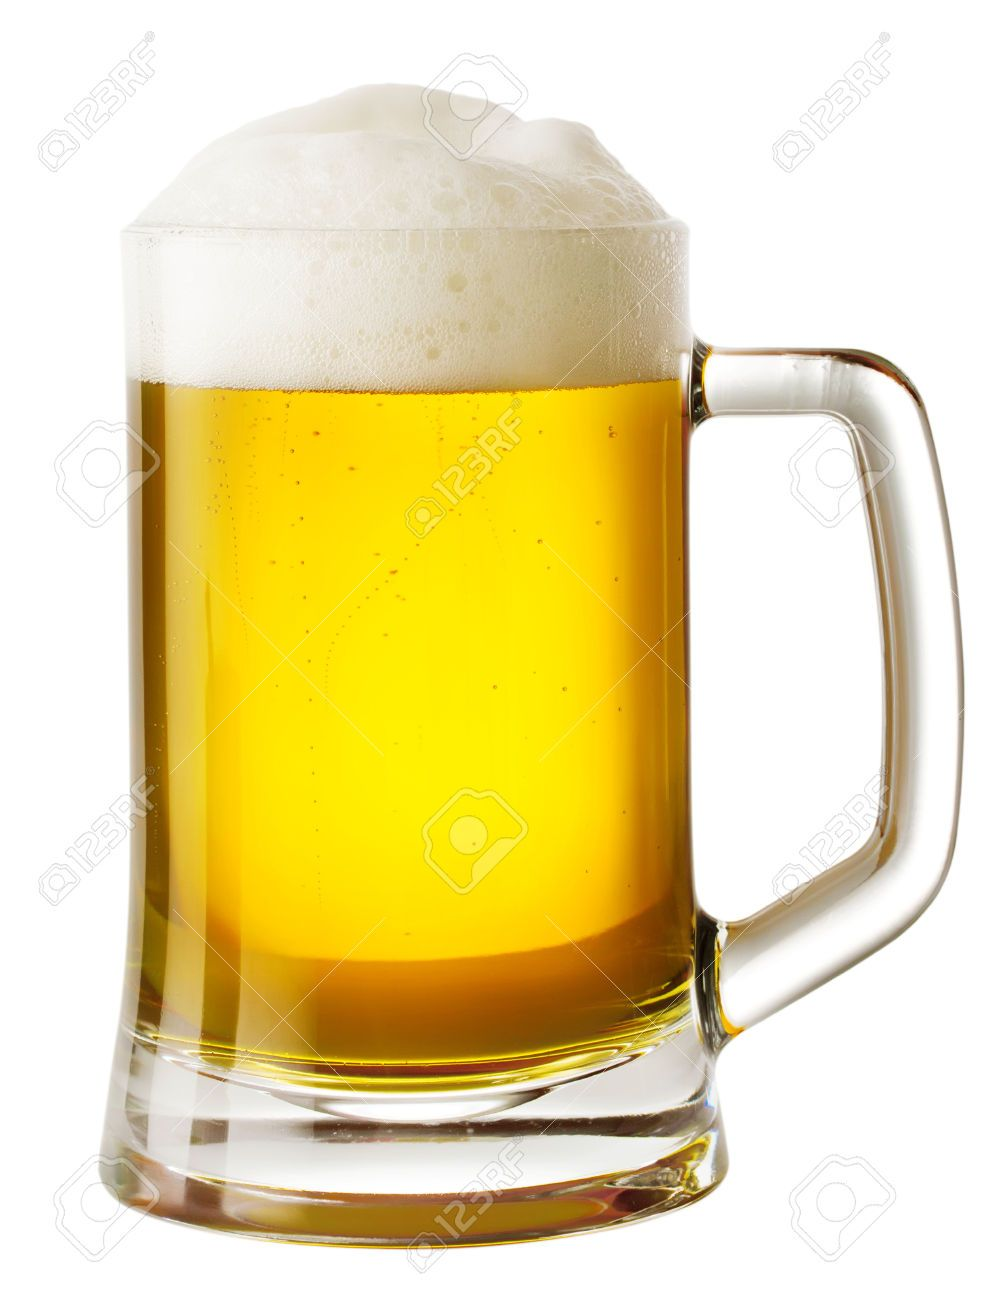 Mug Of Beer With Foam Isolated On White Background Beer Mugs Beer Mugs